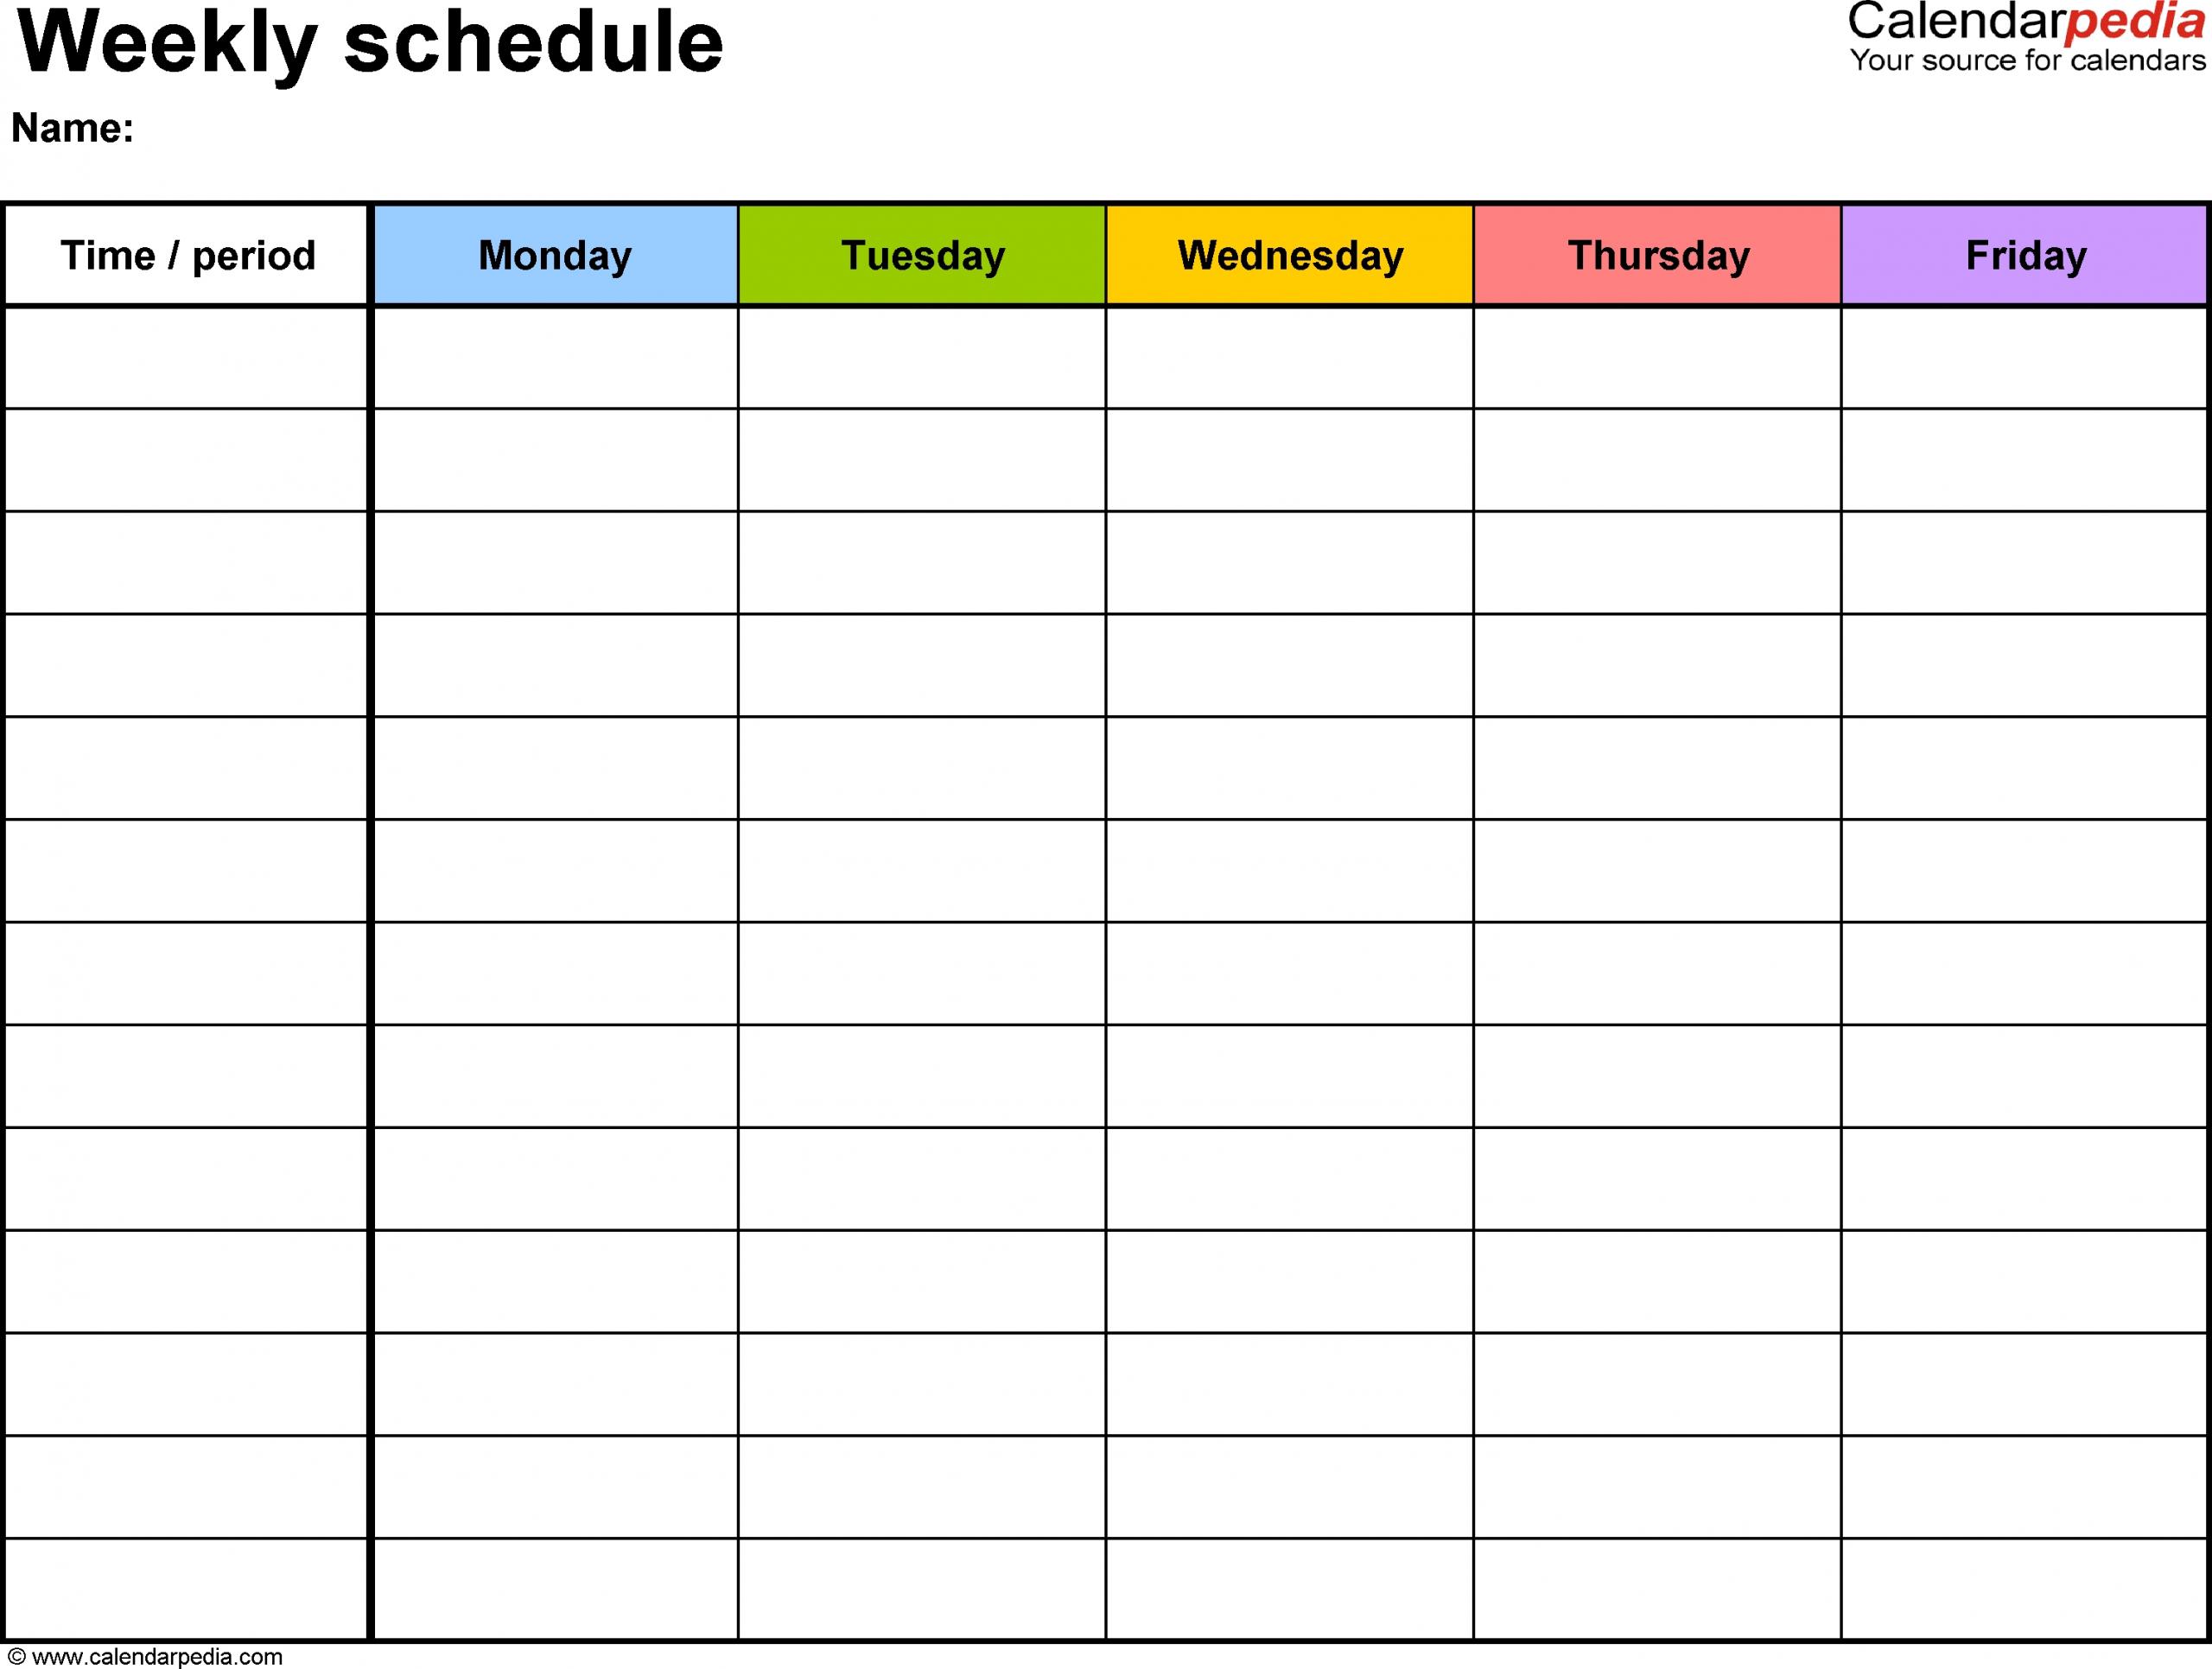 Monday Friday Blank Weekly Schedule | Calendar Template Weekly Schedule Template Monday Friday